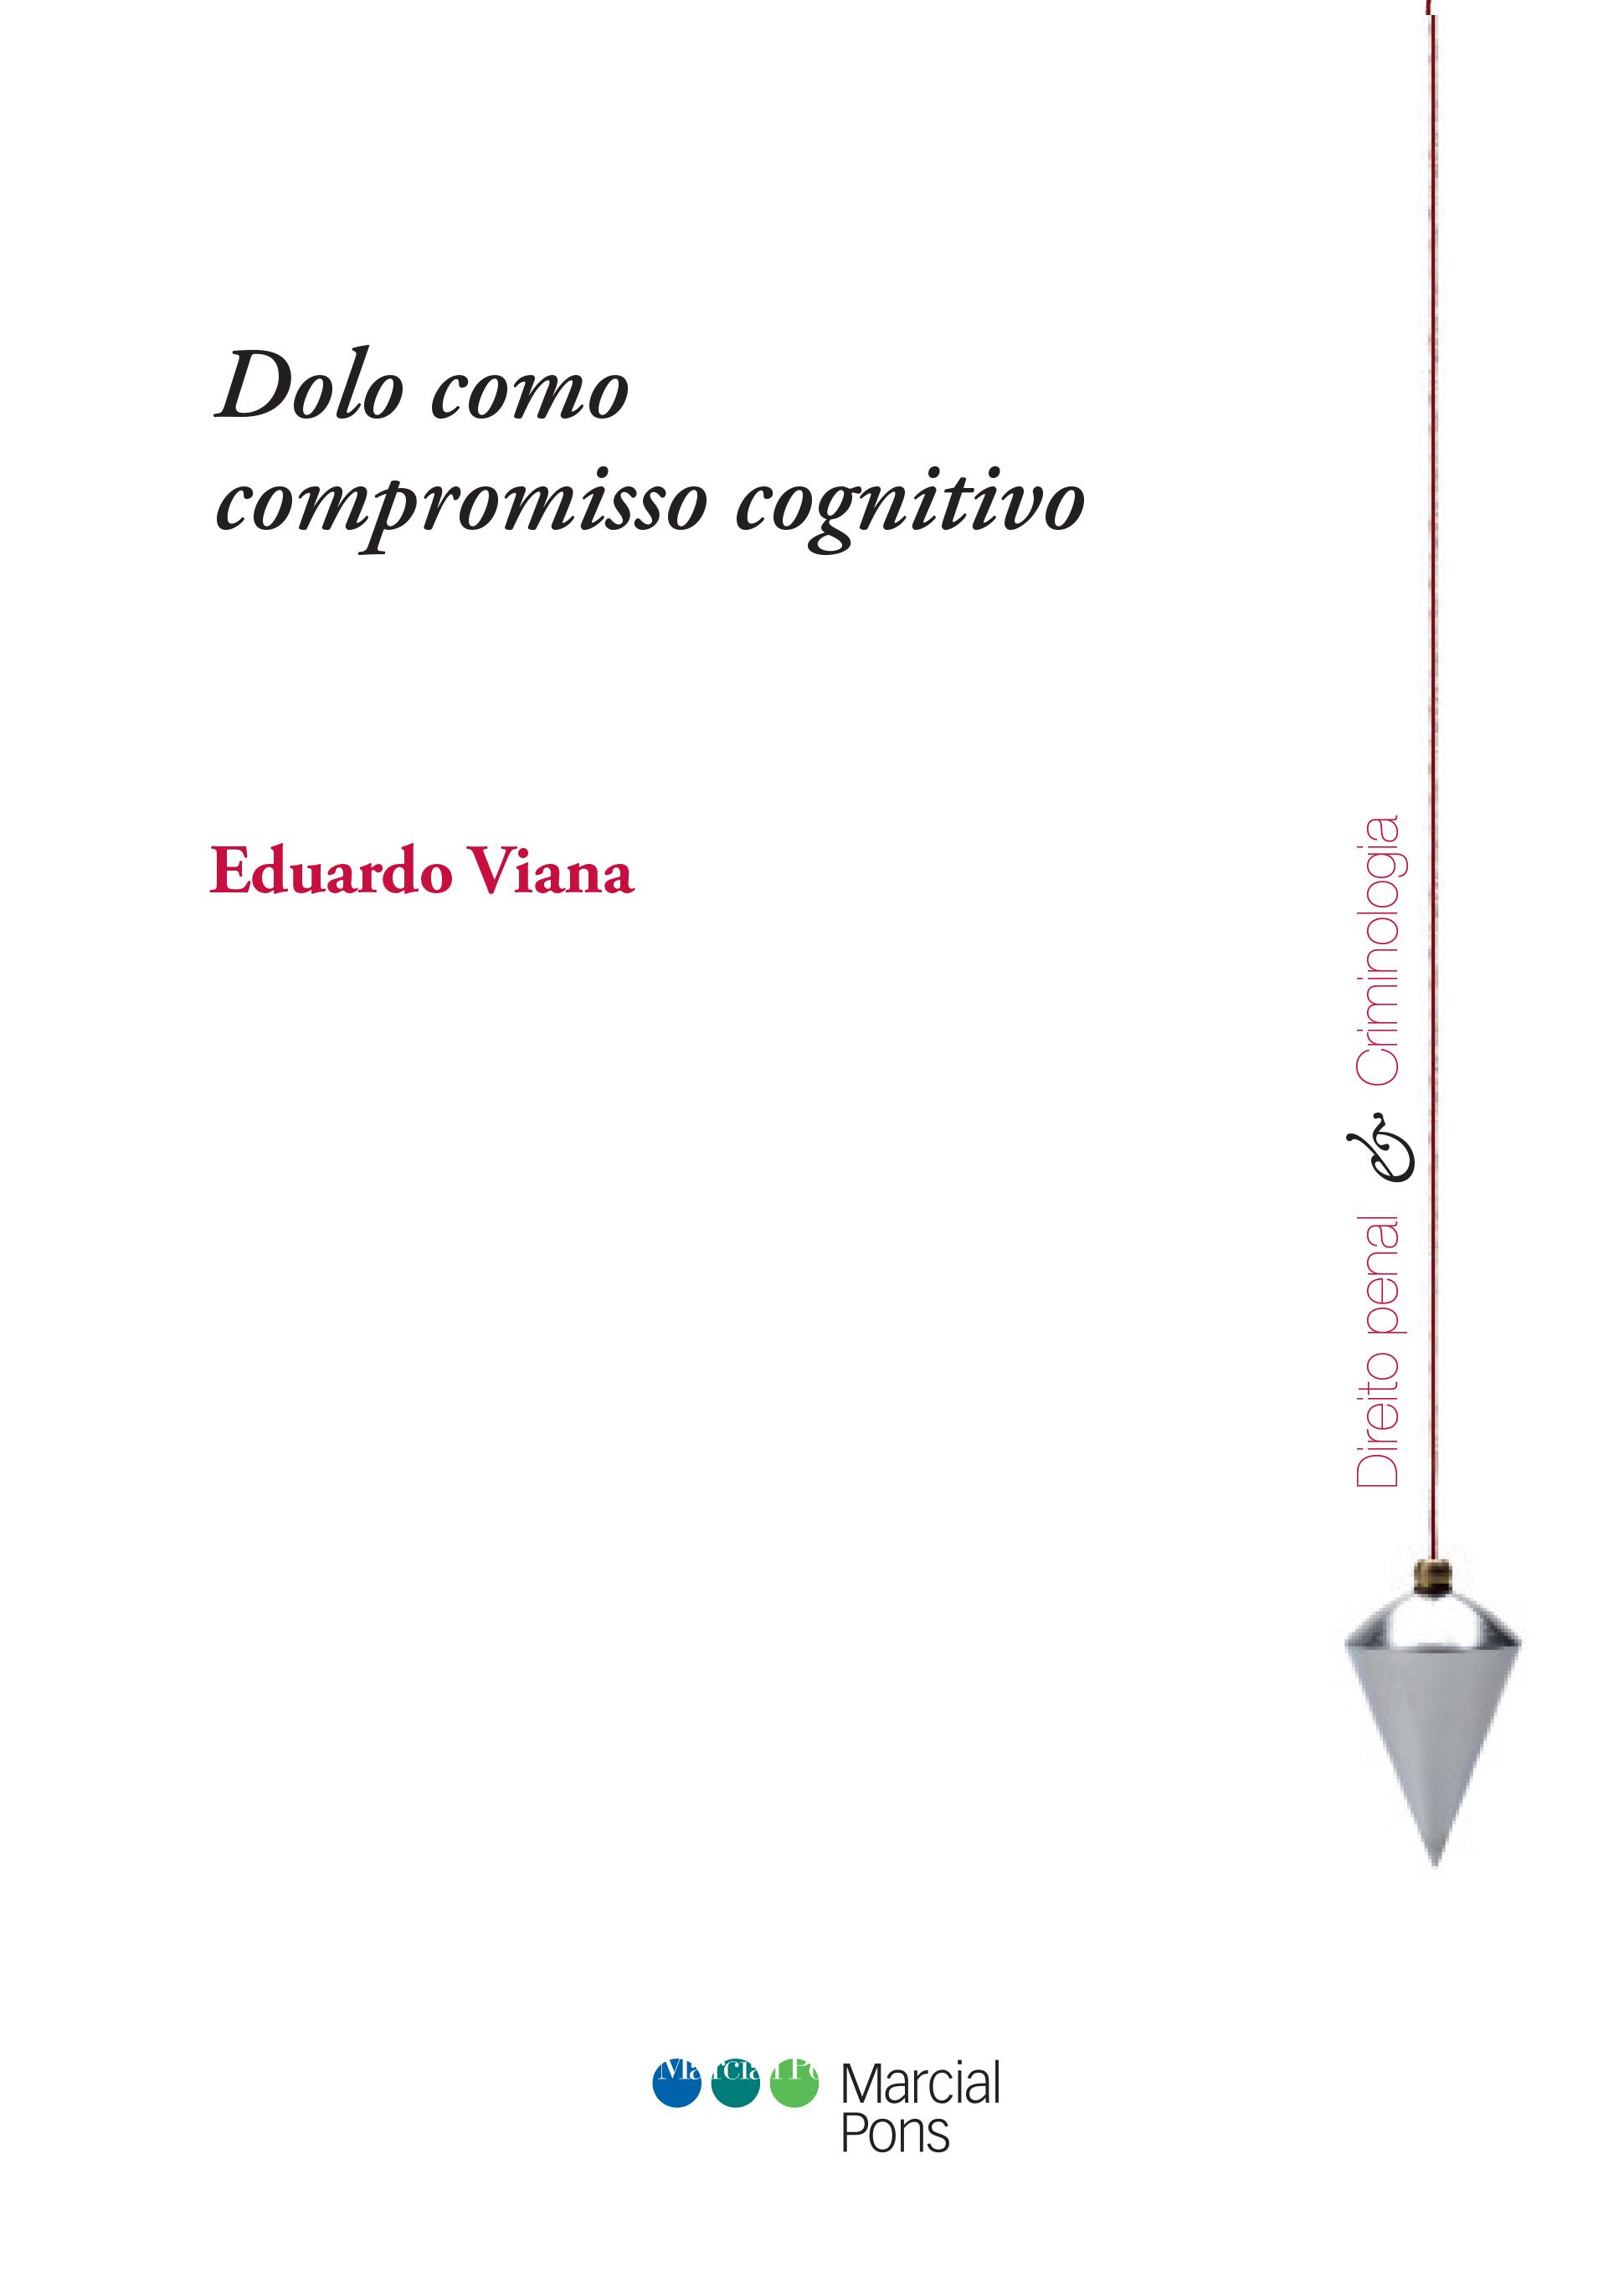 Portada del libro Dolo como compromisso cognitivo